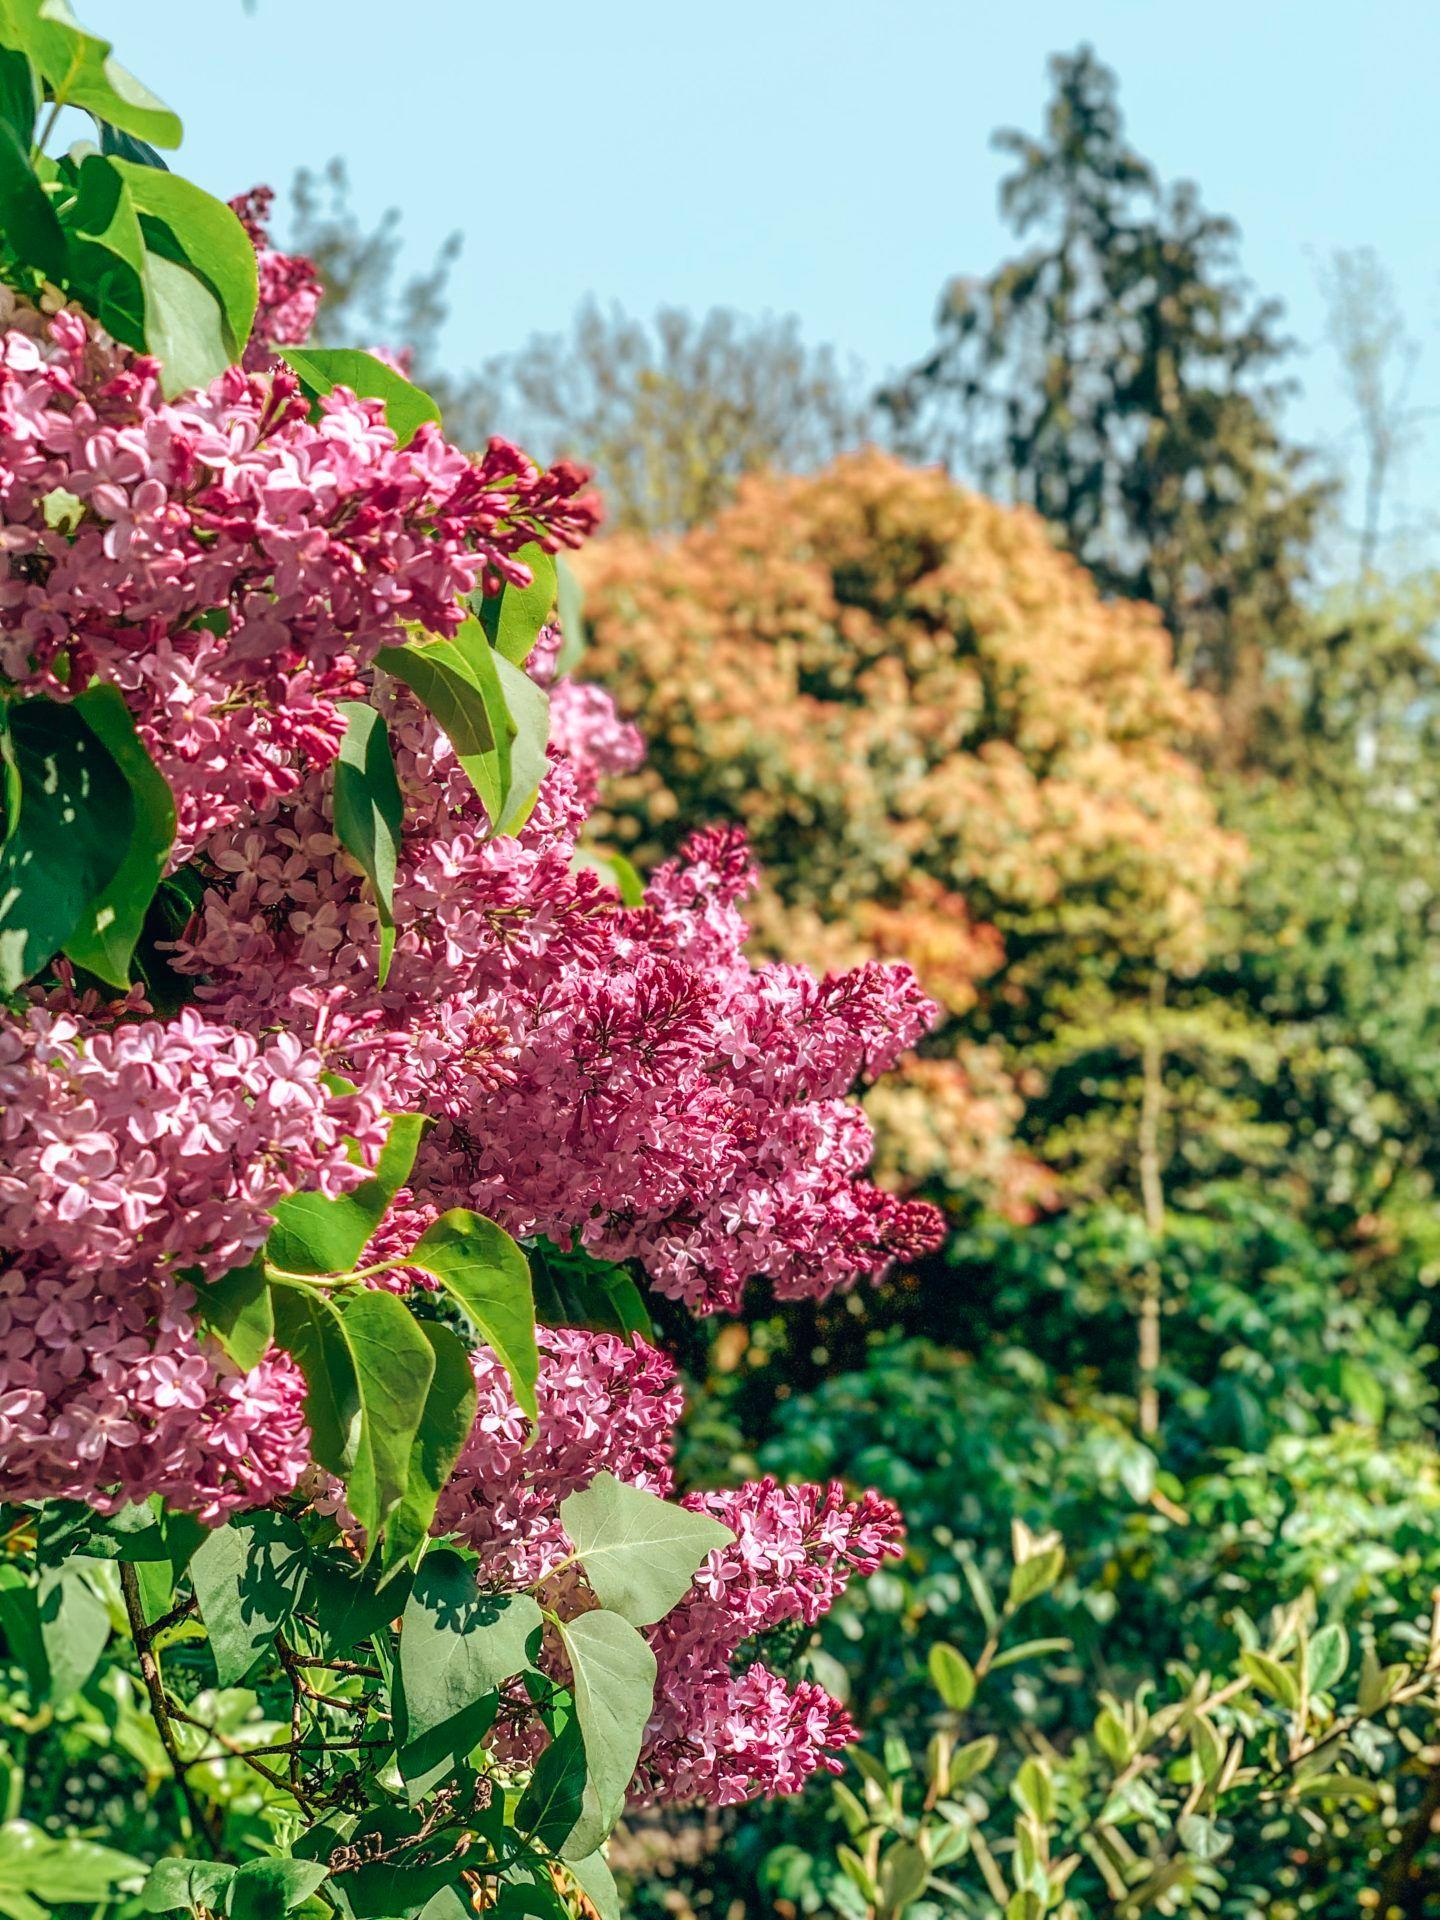 Spring blossom in London